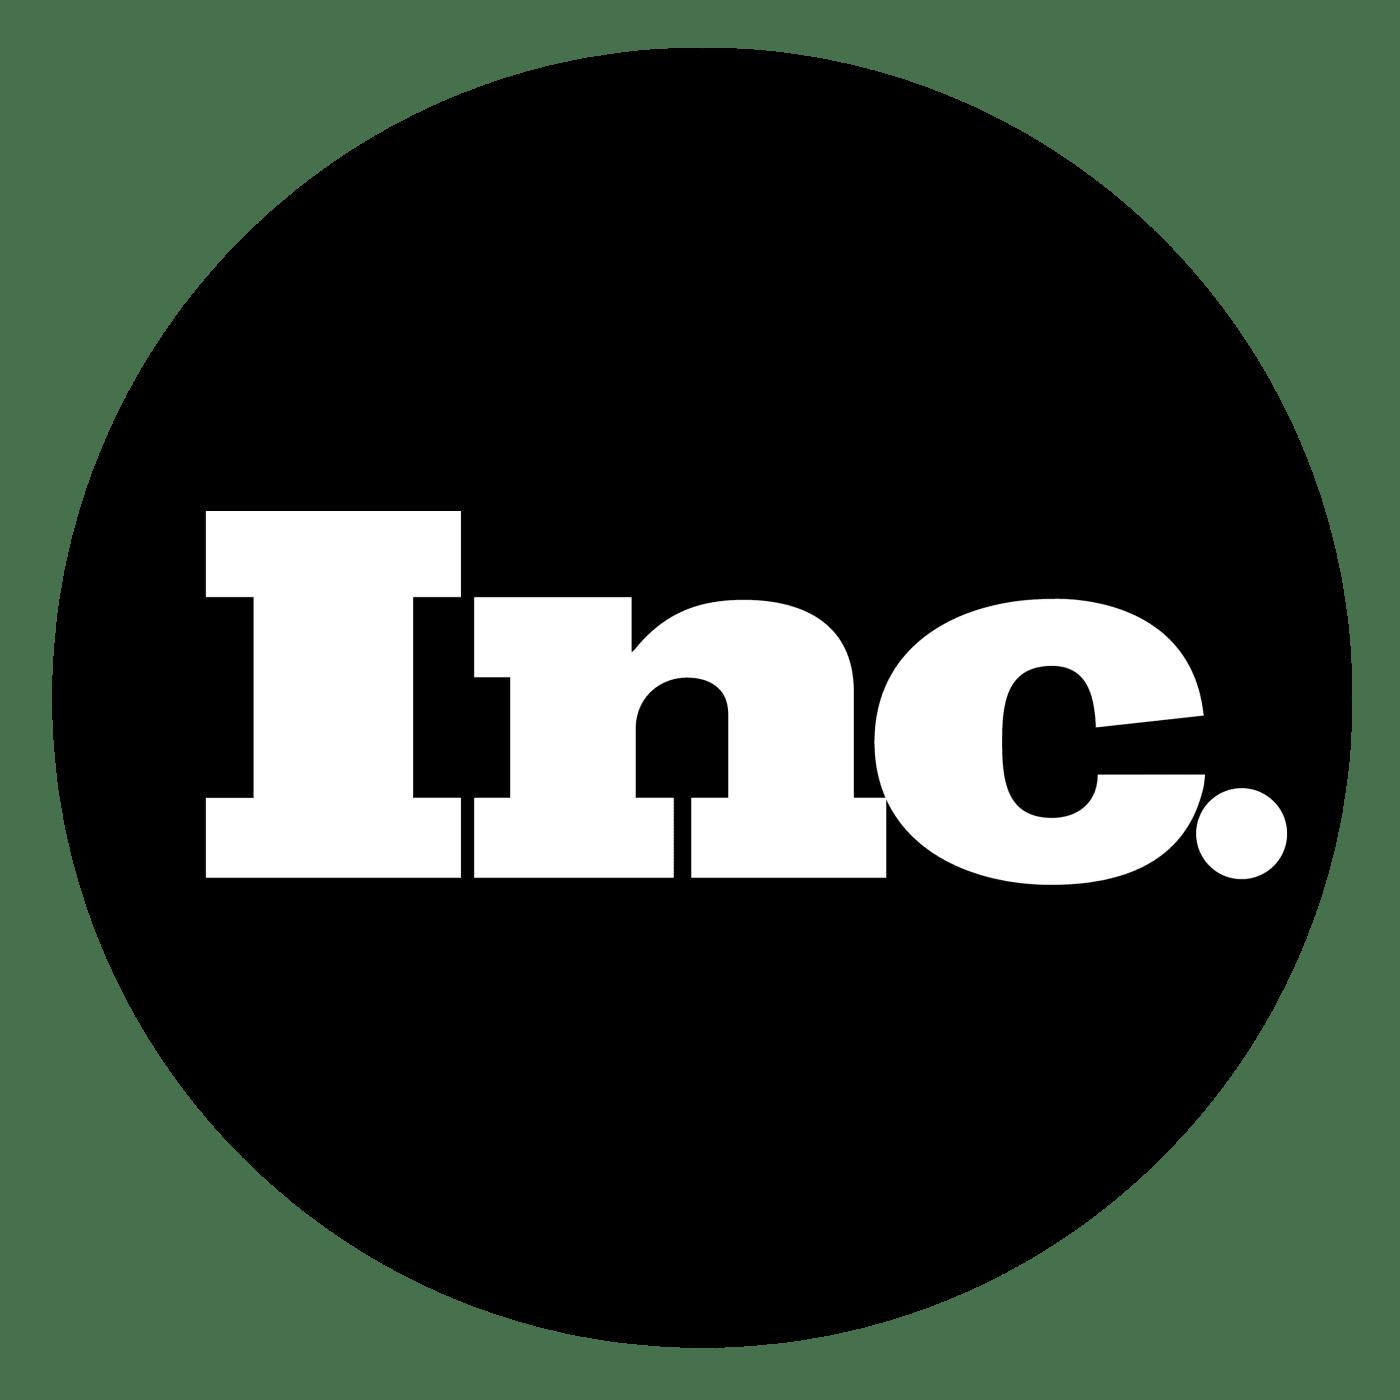 Inc. logo